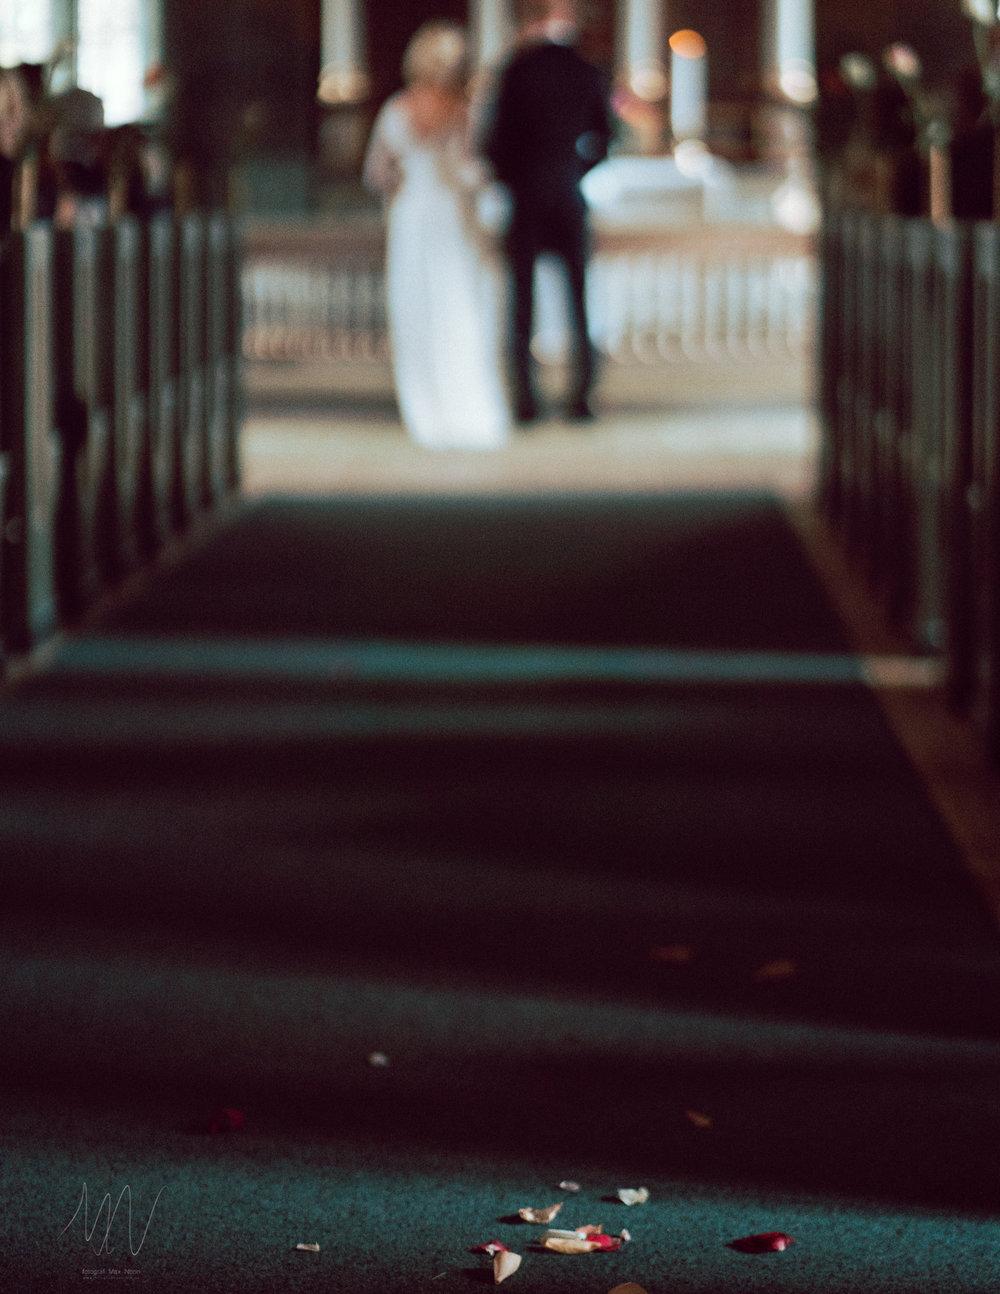 Bröllop-fotografmaxnorin.se-MariaMarcus-82.JPG